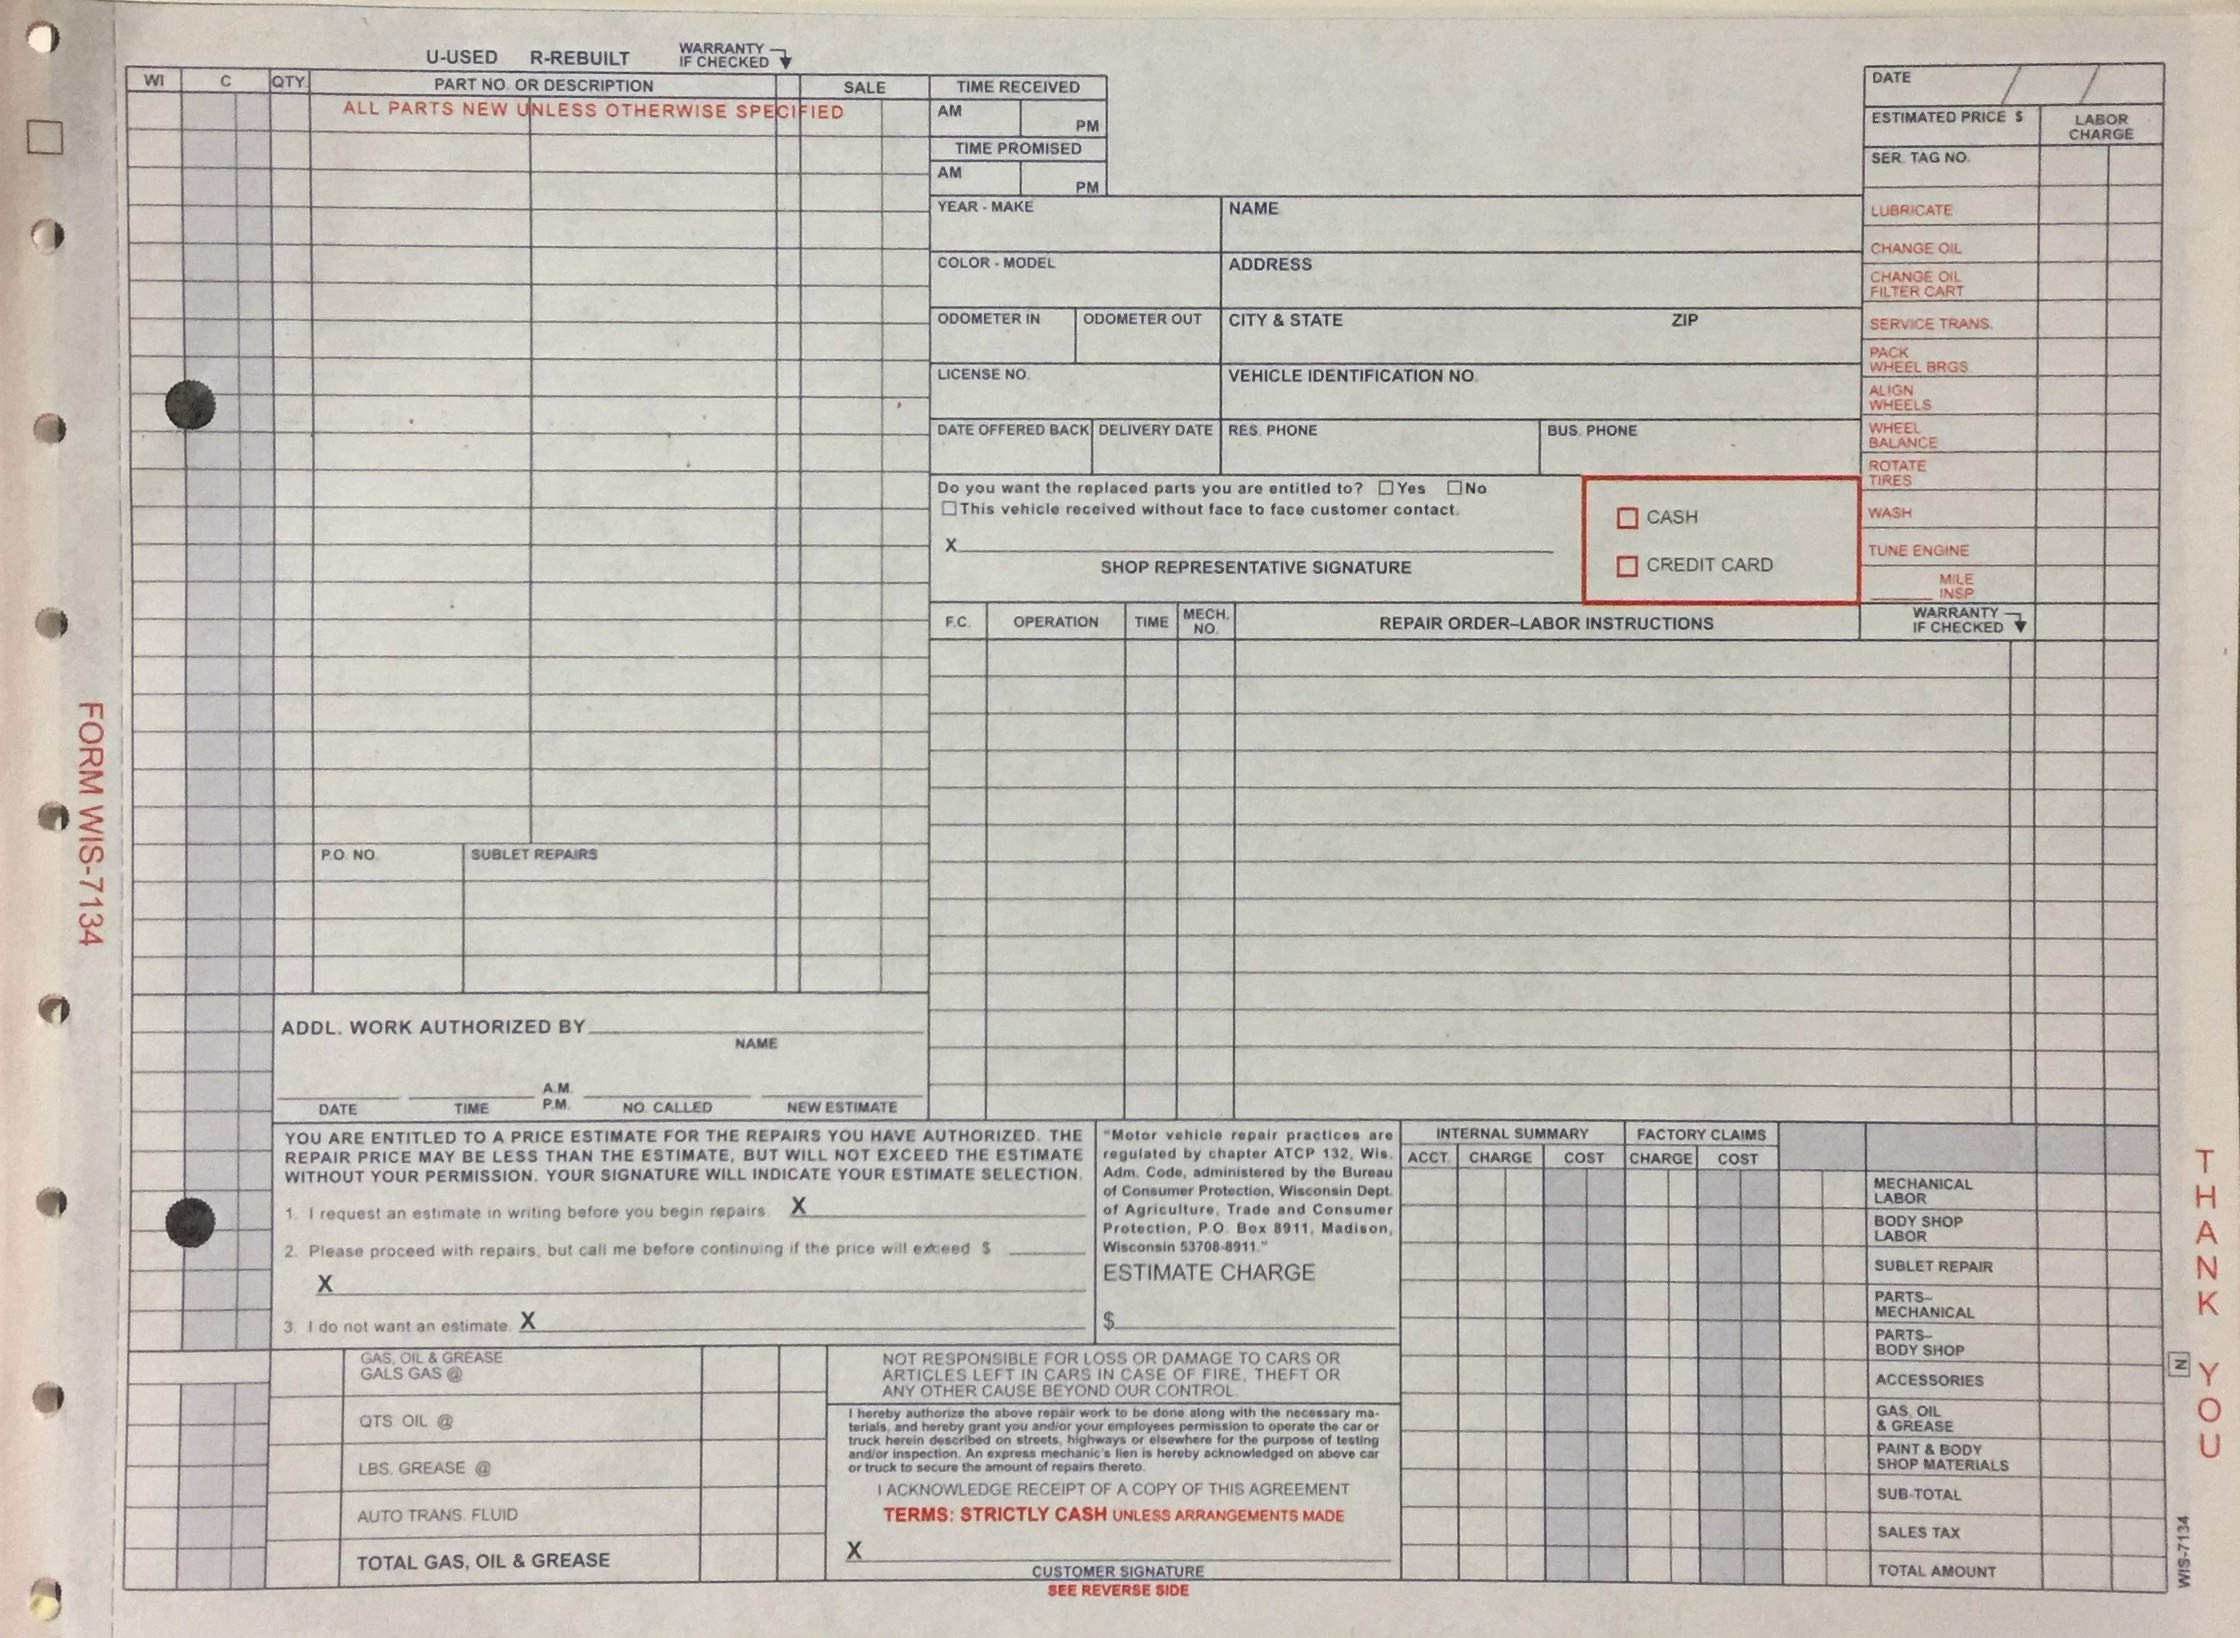 Generic Repair Order Form 100 Qty. - WIS-7134 (P13R)